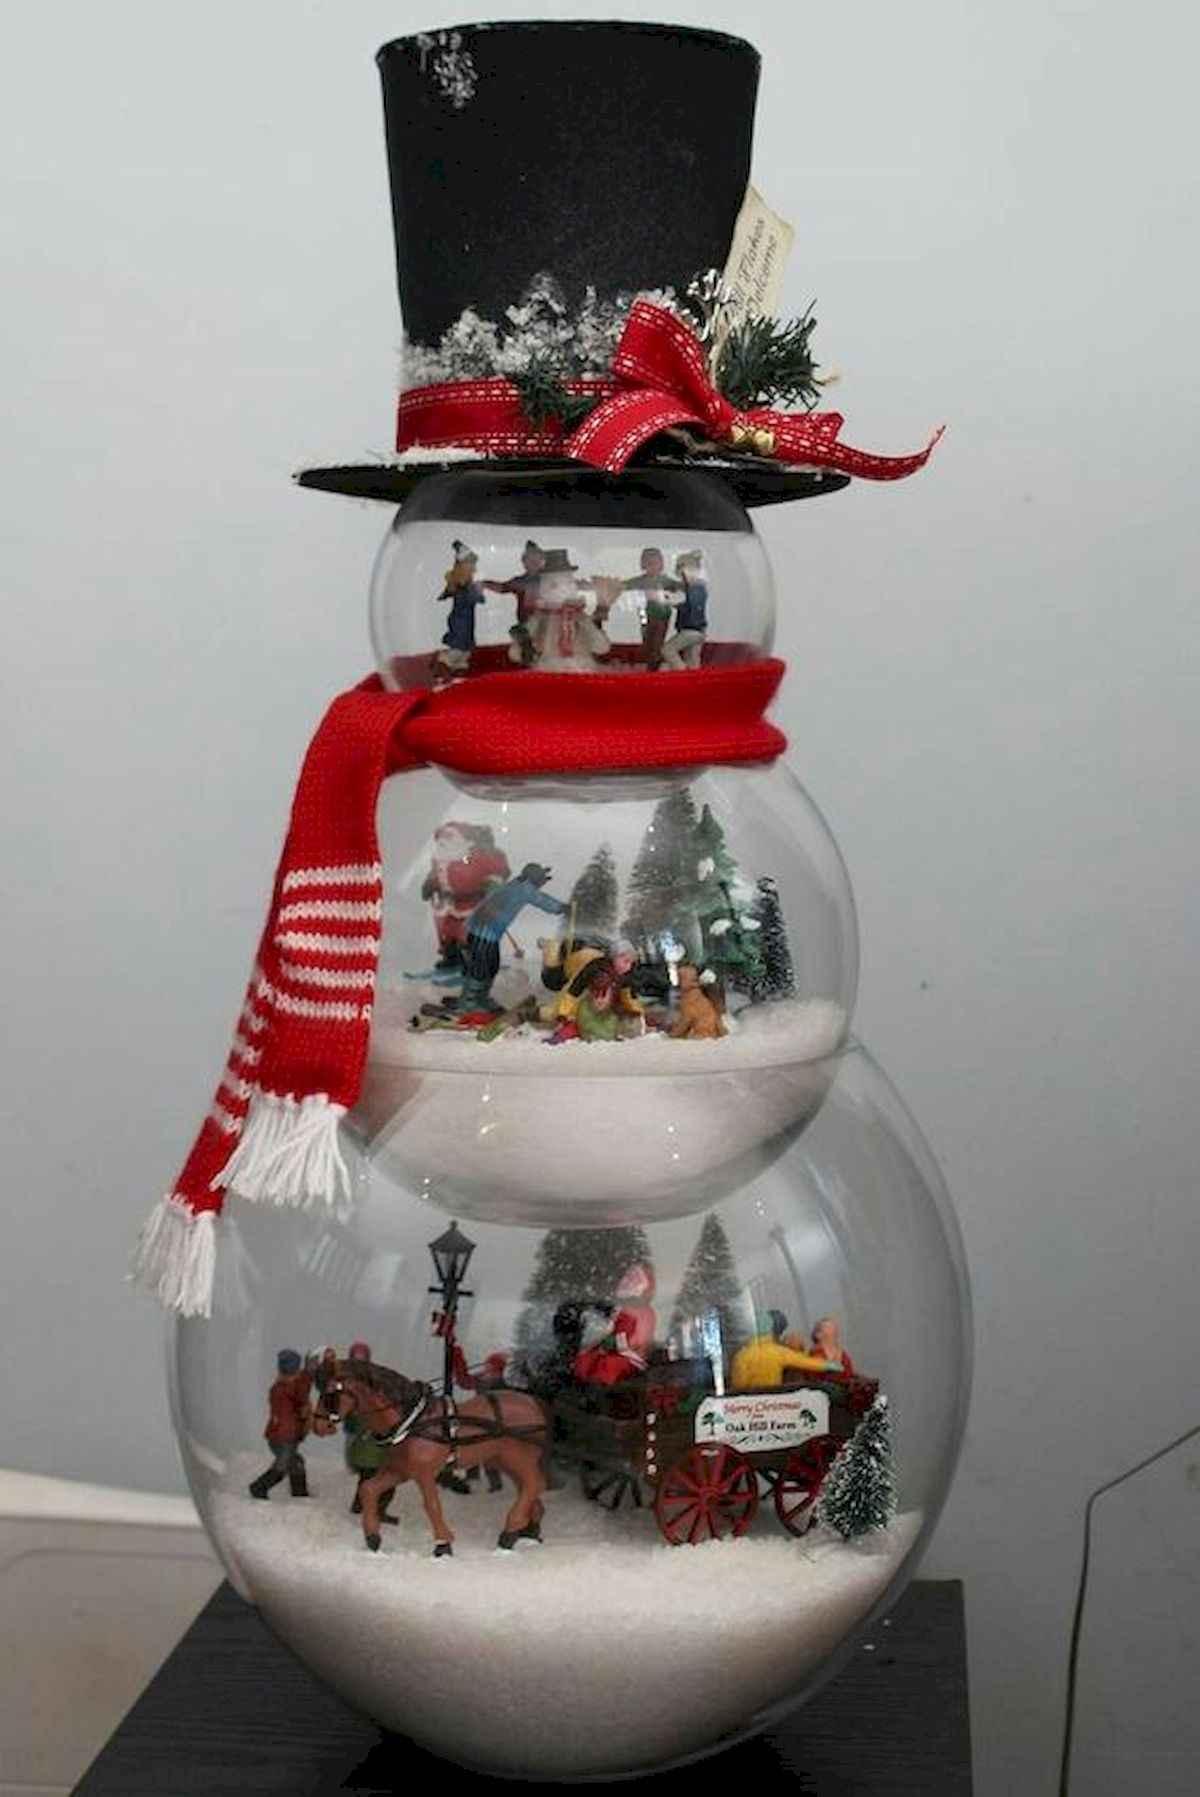 50 diy christmas decorations ideas (22)